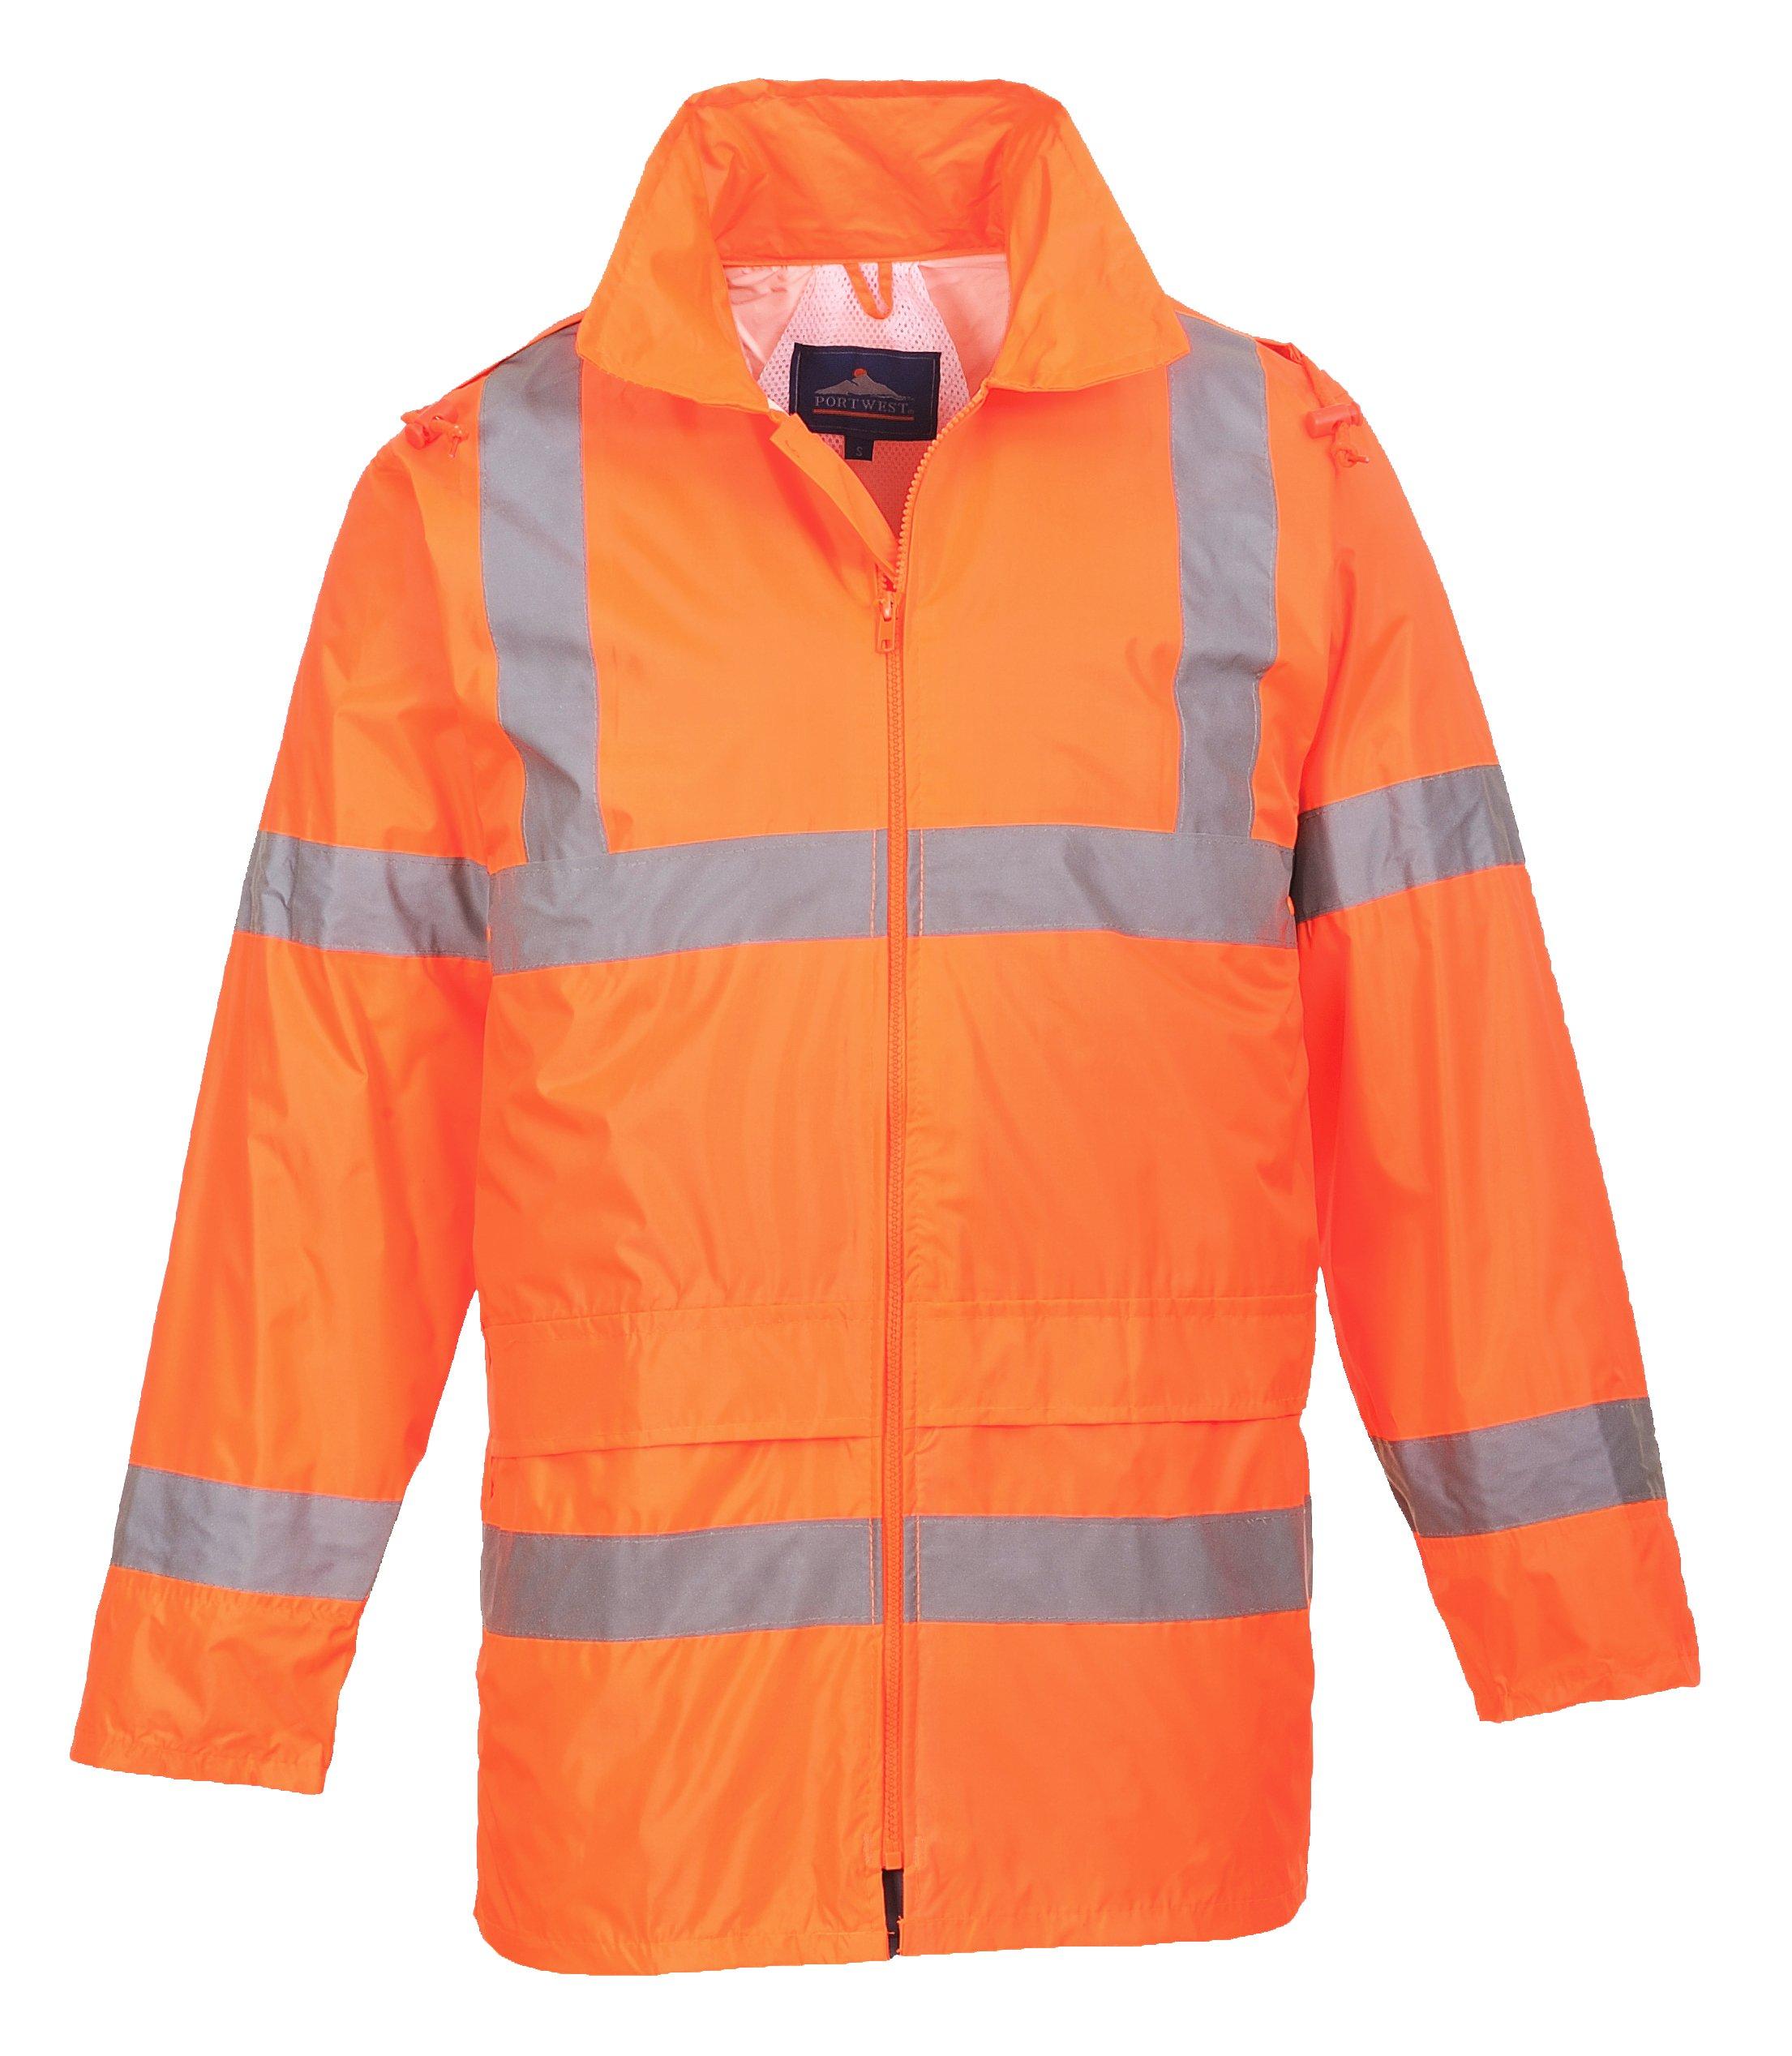 Portwest Workwear Mens Hi-Vis Rain Jacket Orange 4XL by Portwest